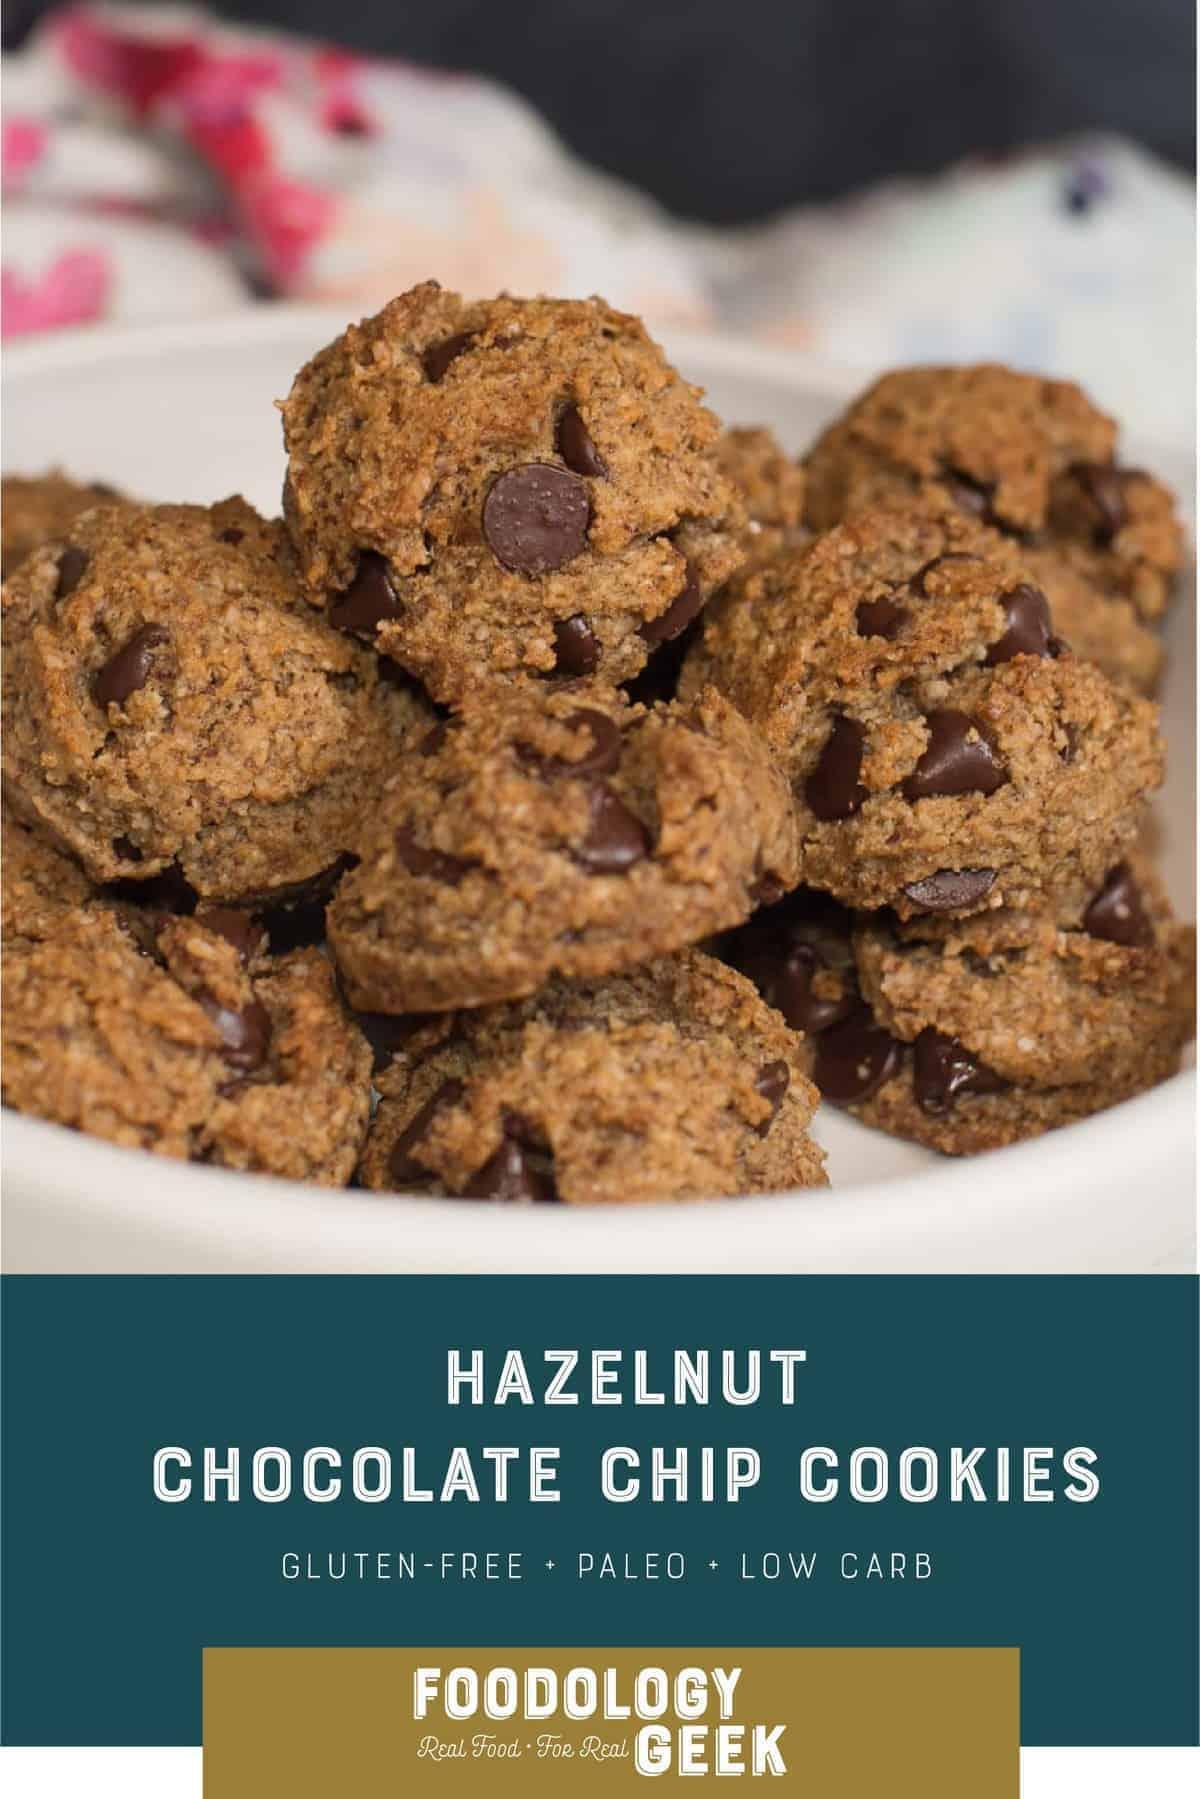 Hazelnut Chocolate Chip Cookies. Paleo cookies for everybody